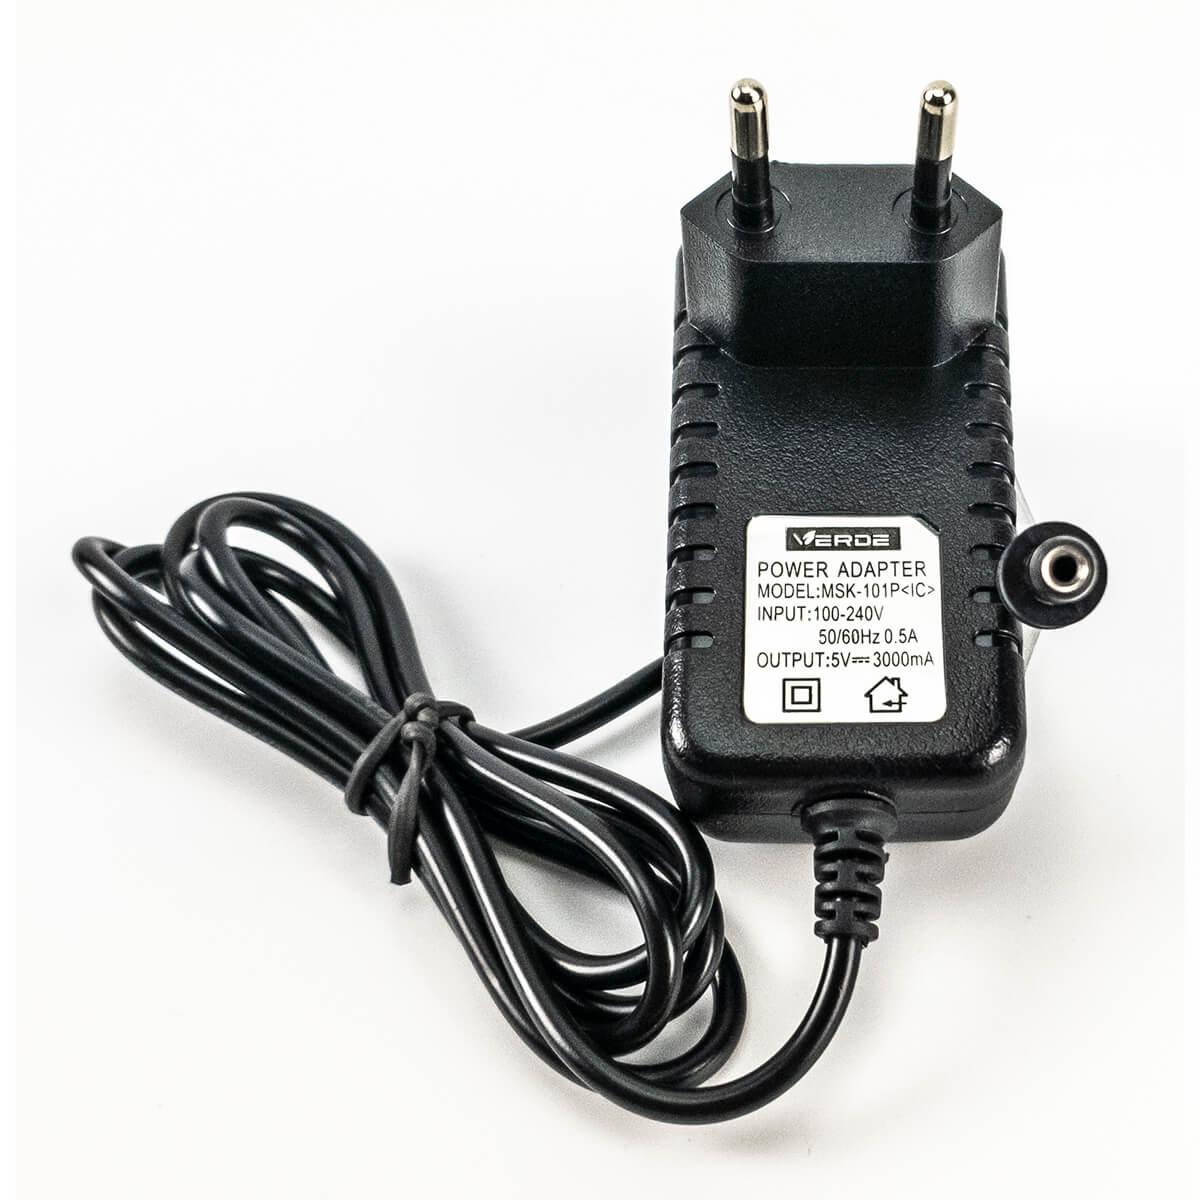 KIT 10 Fontes Chaveada 5v 3a Plug P4 5,5x2,5mm Bivolt Verde MSK-101P